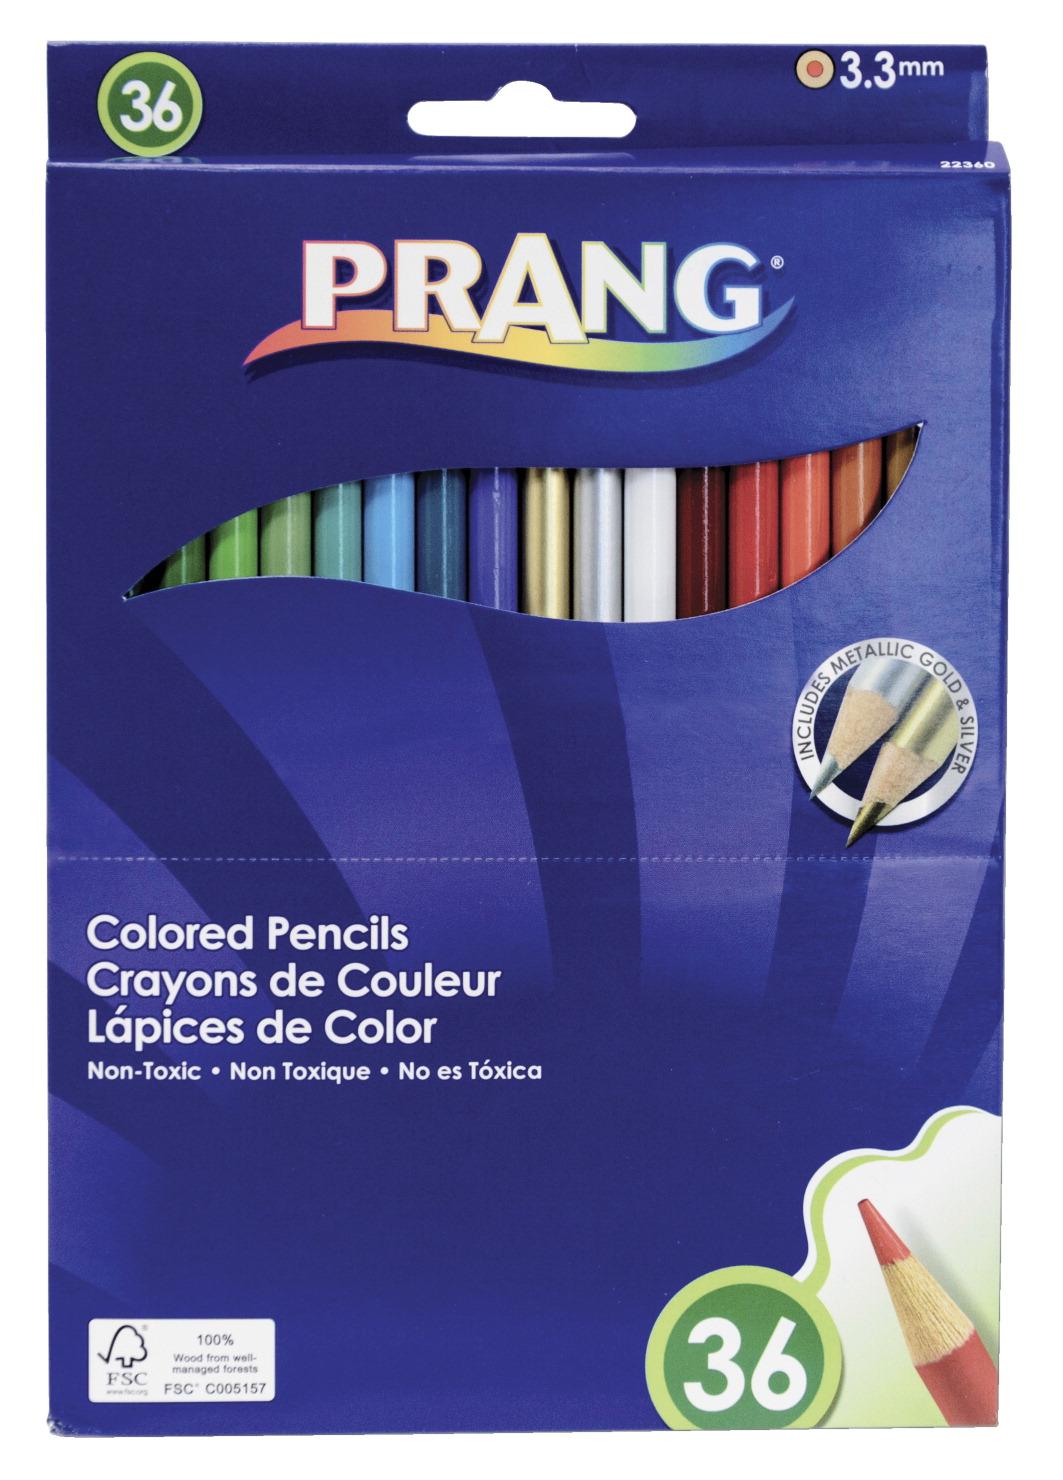 Prang Colored Pencils, Assorted Colors, Set of 36   eBay